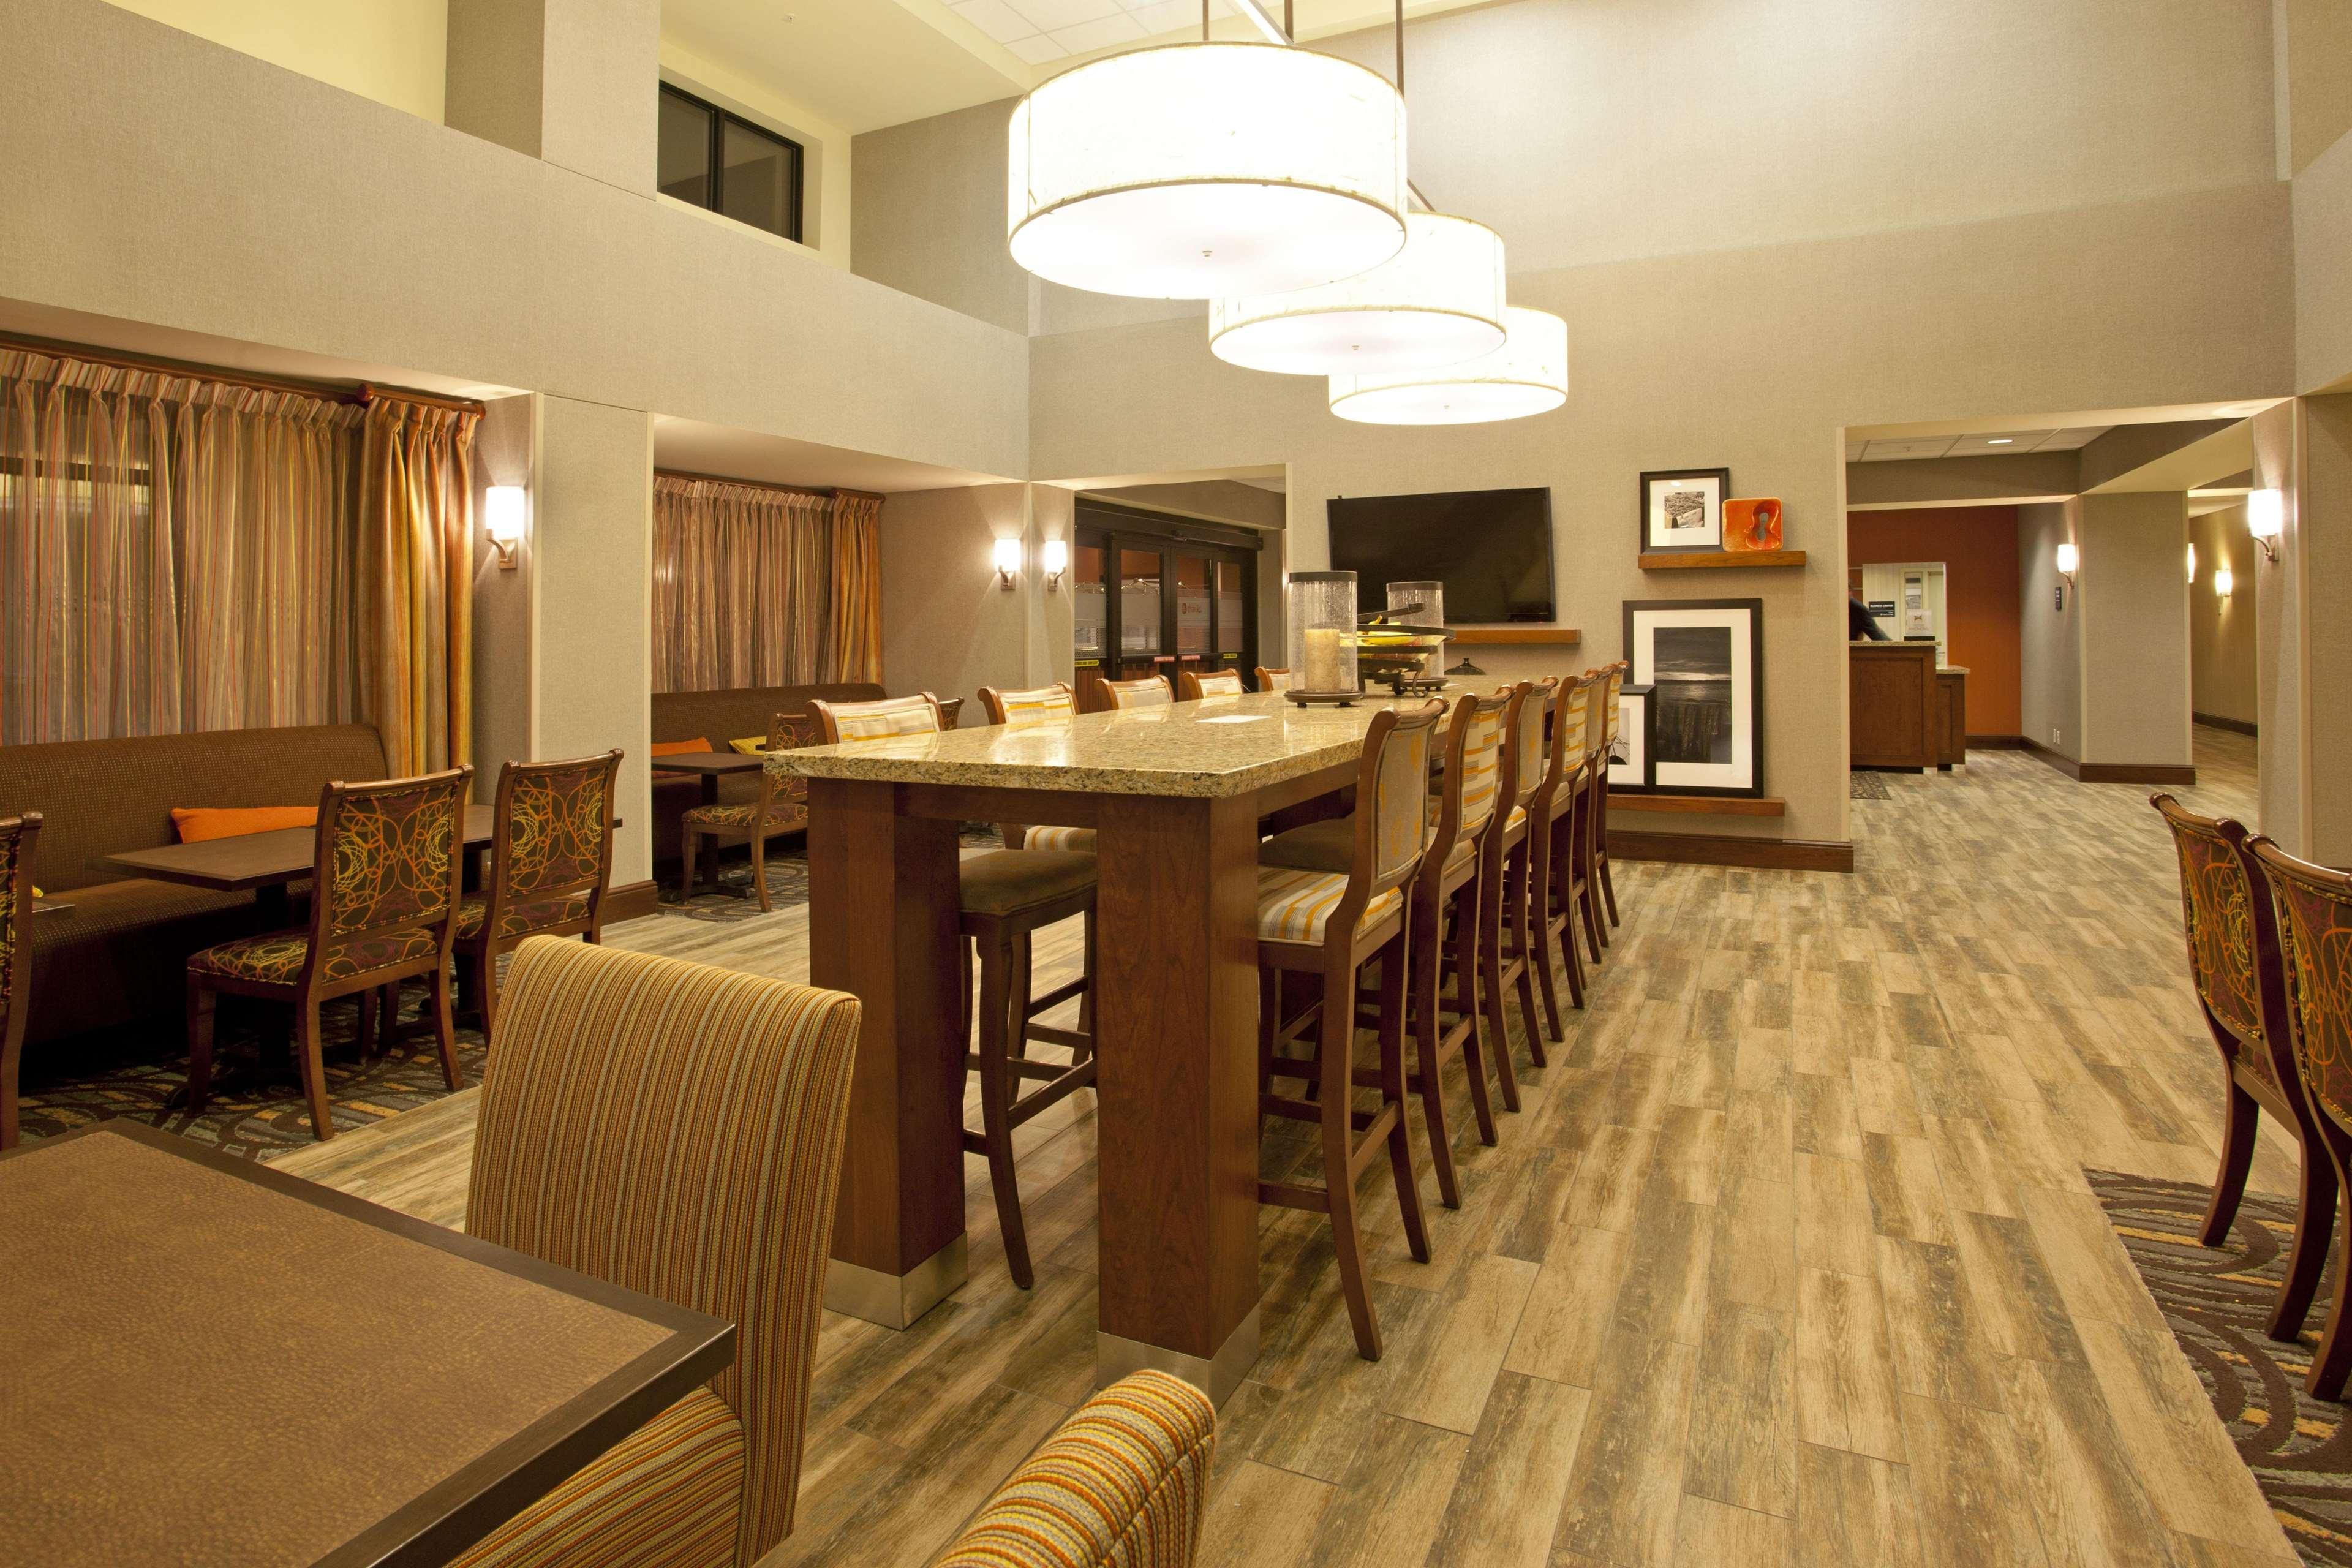 Hampton Inn Suites Minneapolis St Paul Arpt-Mall of America